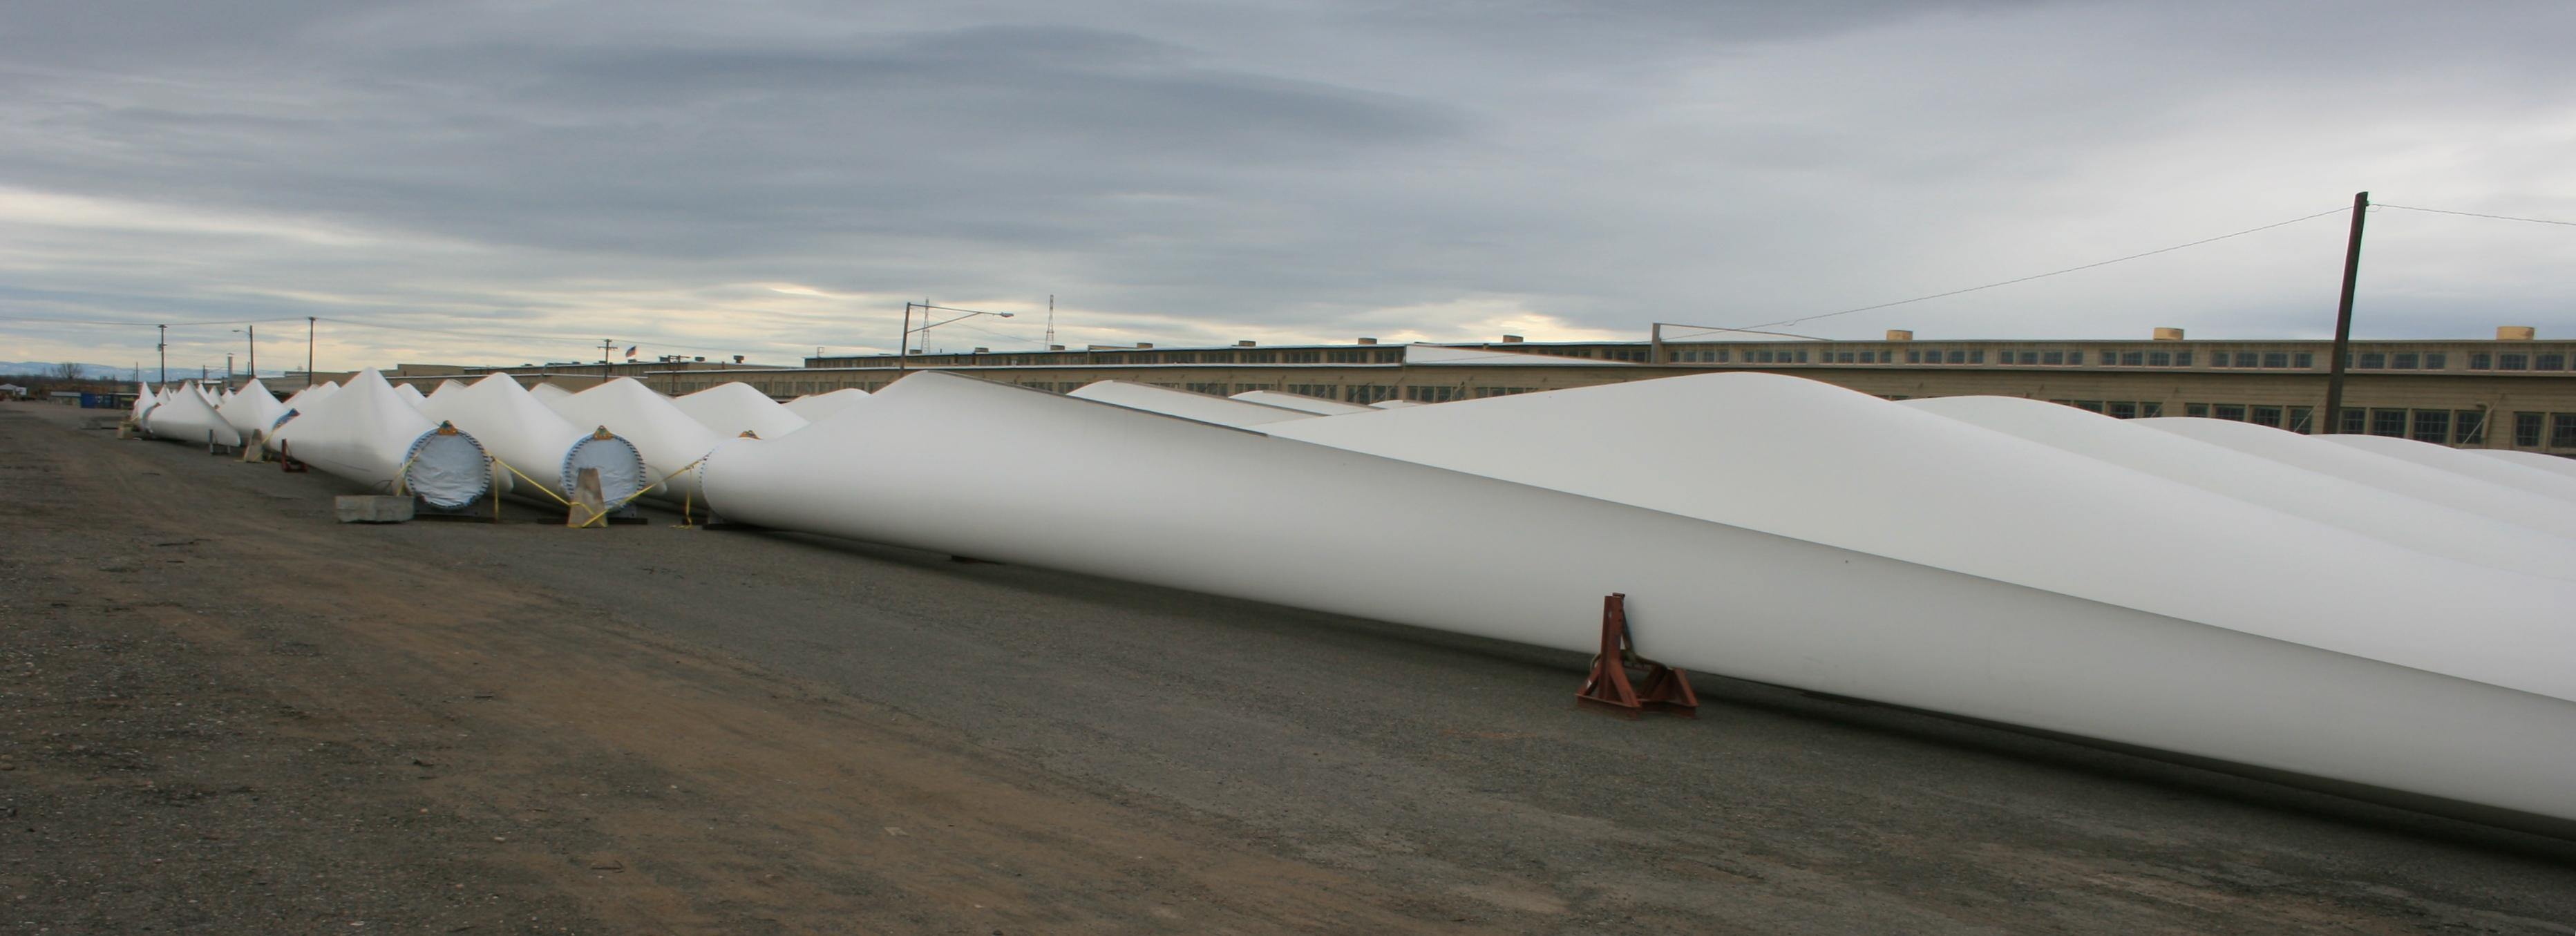 Wind-turbine aerodynamics - Wikiwand